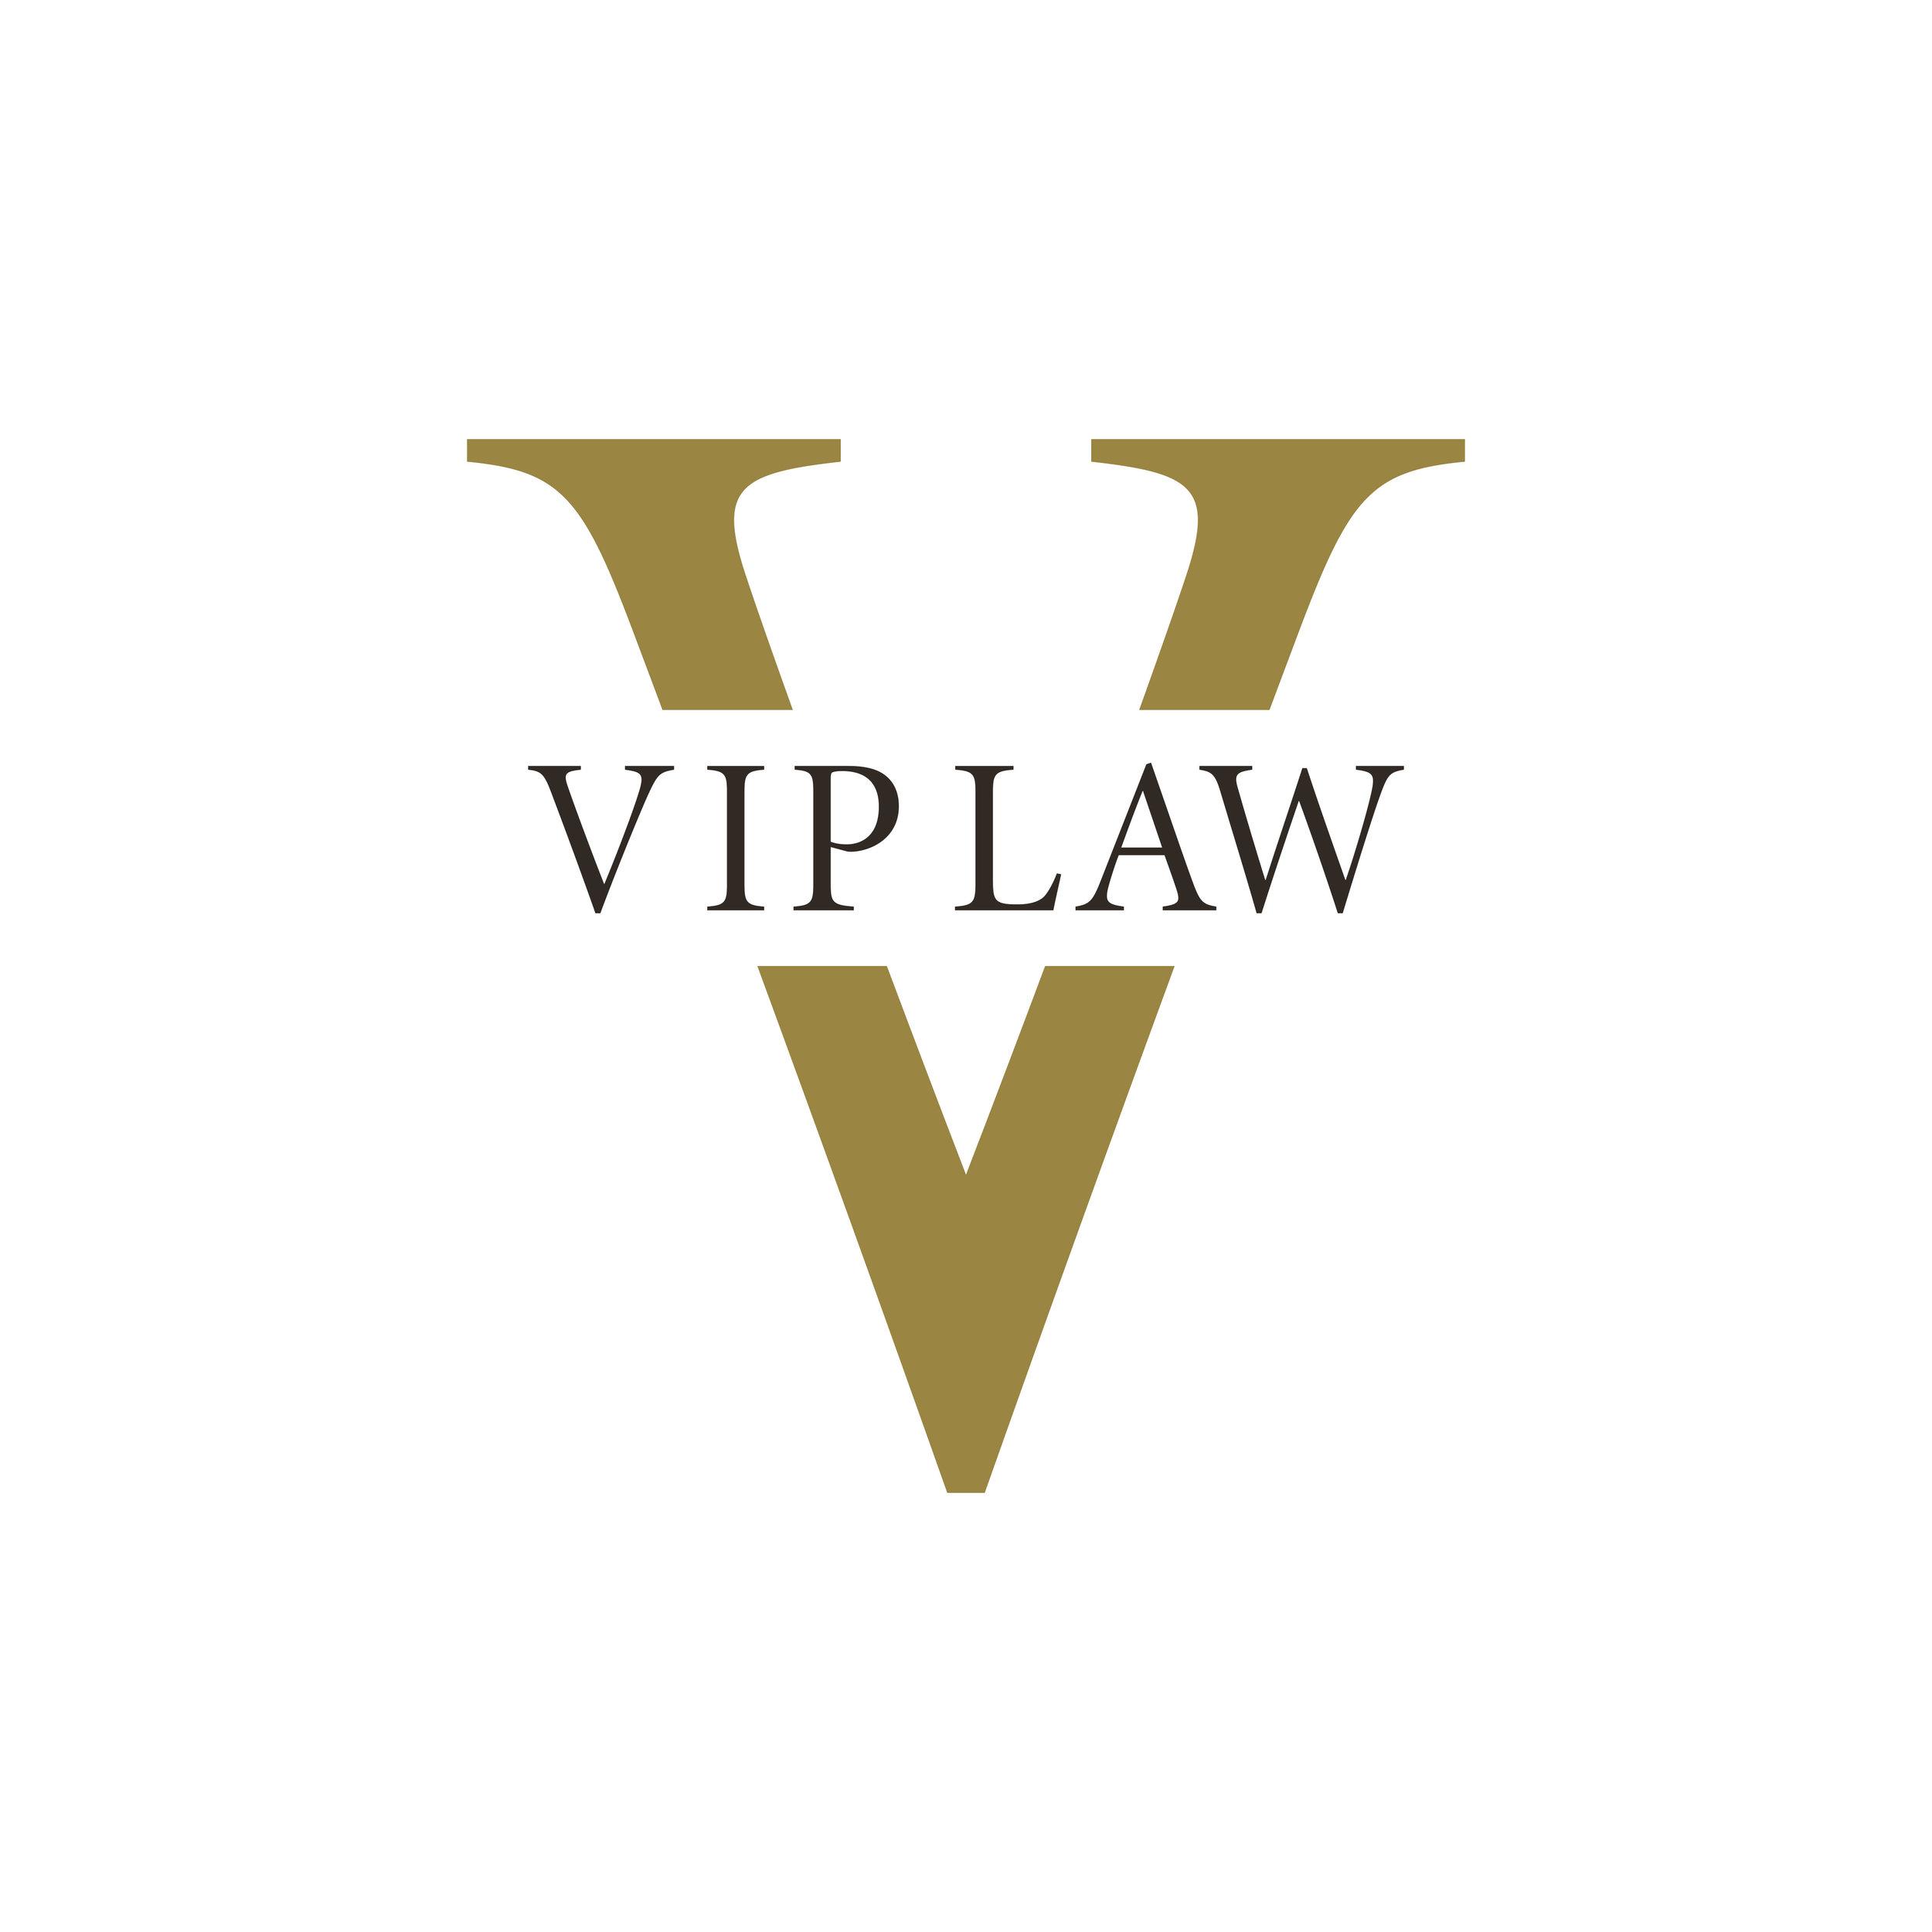 https://viplaw.com/